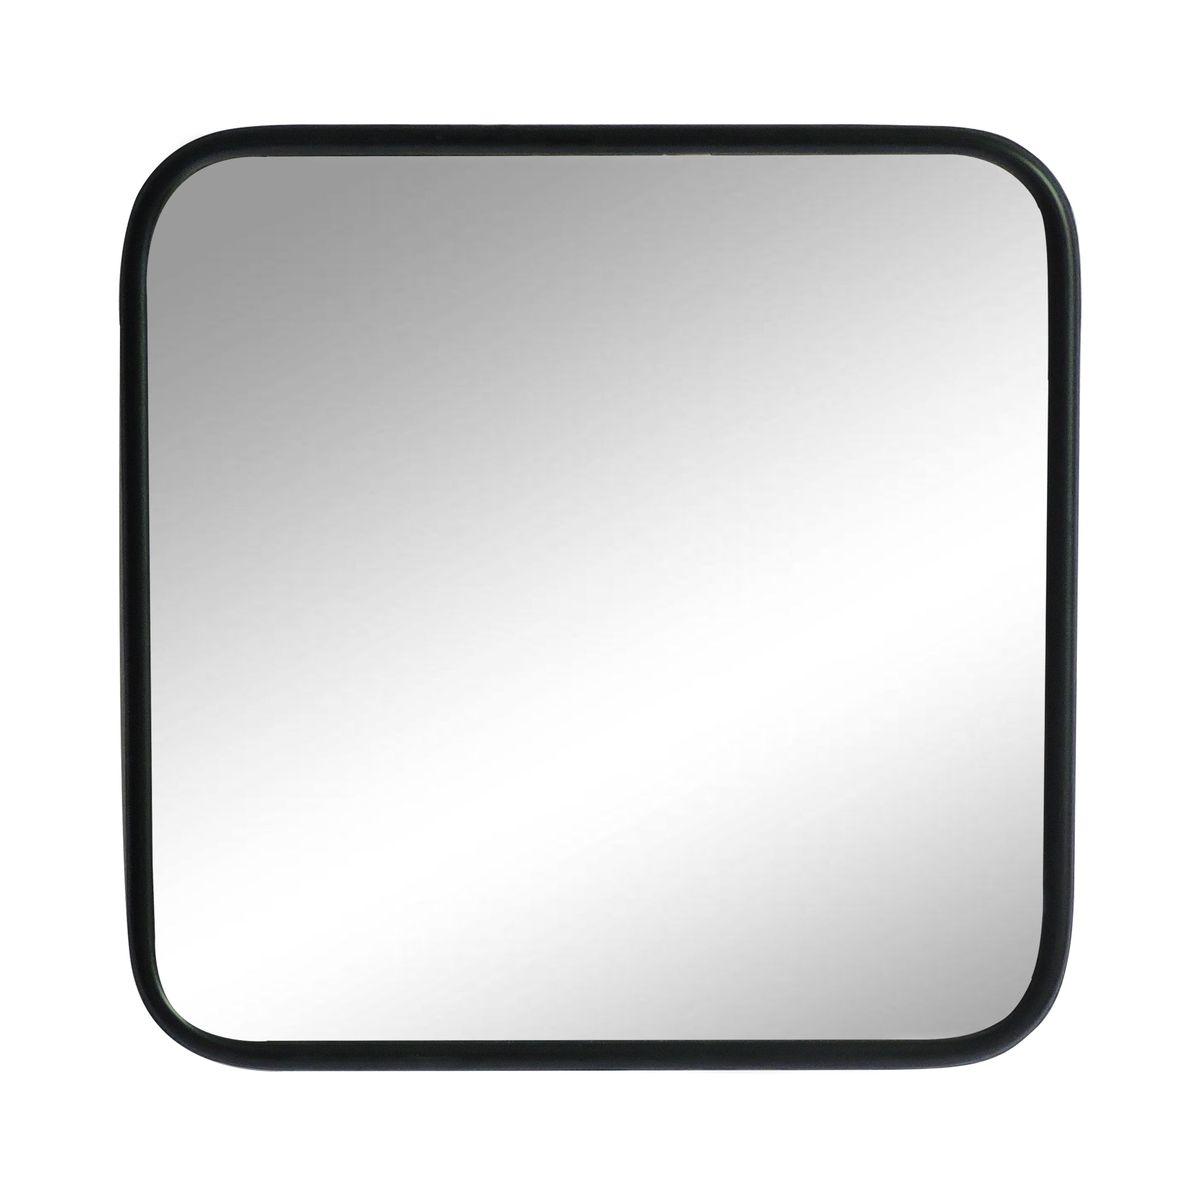 Miroir carré angles arrondis métal noir 45x45